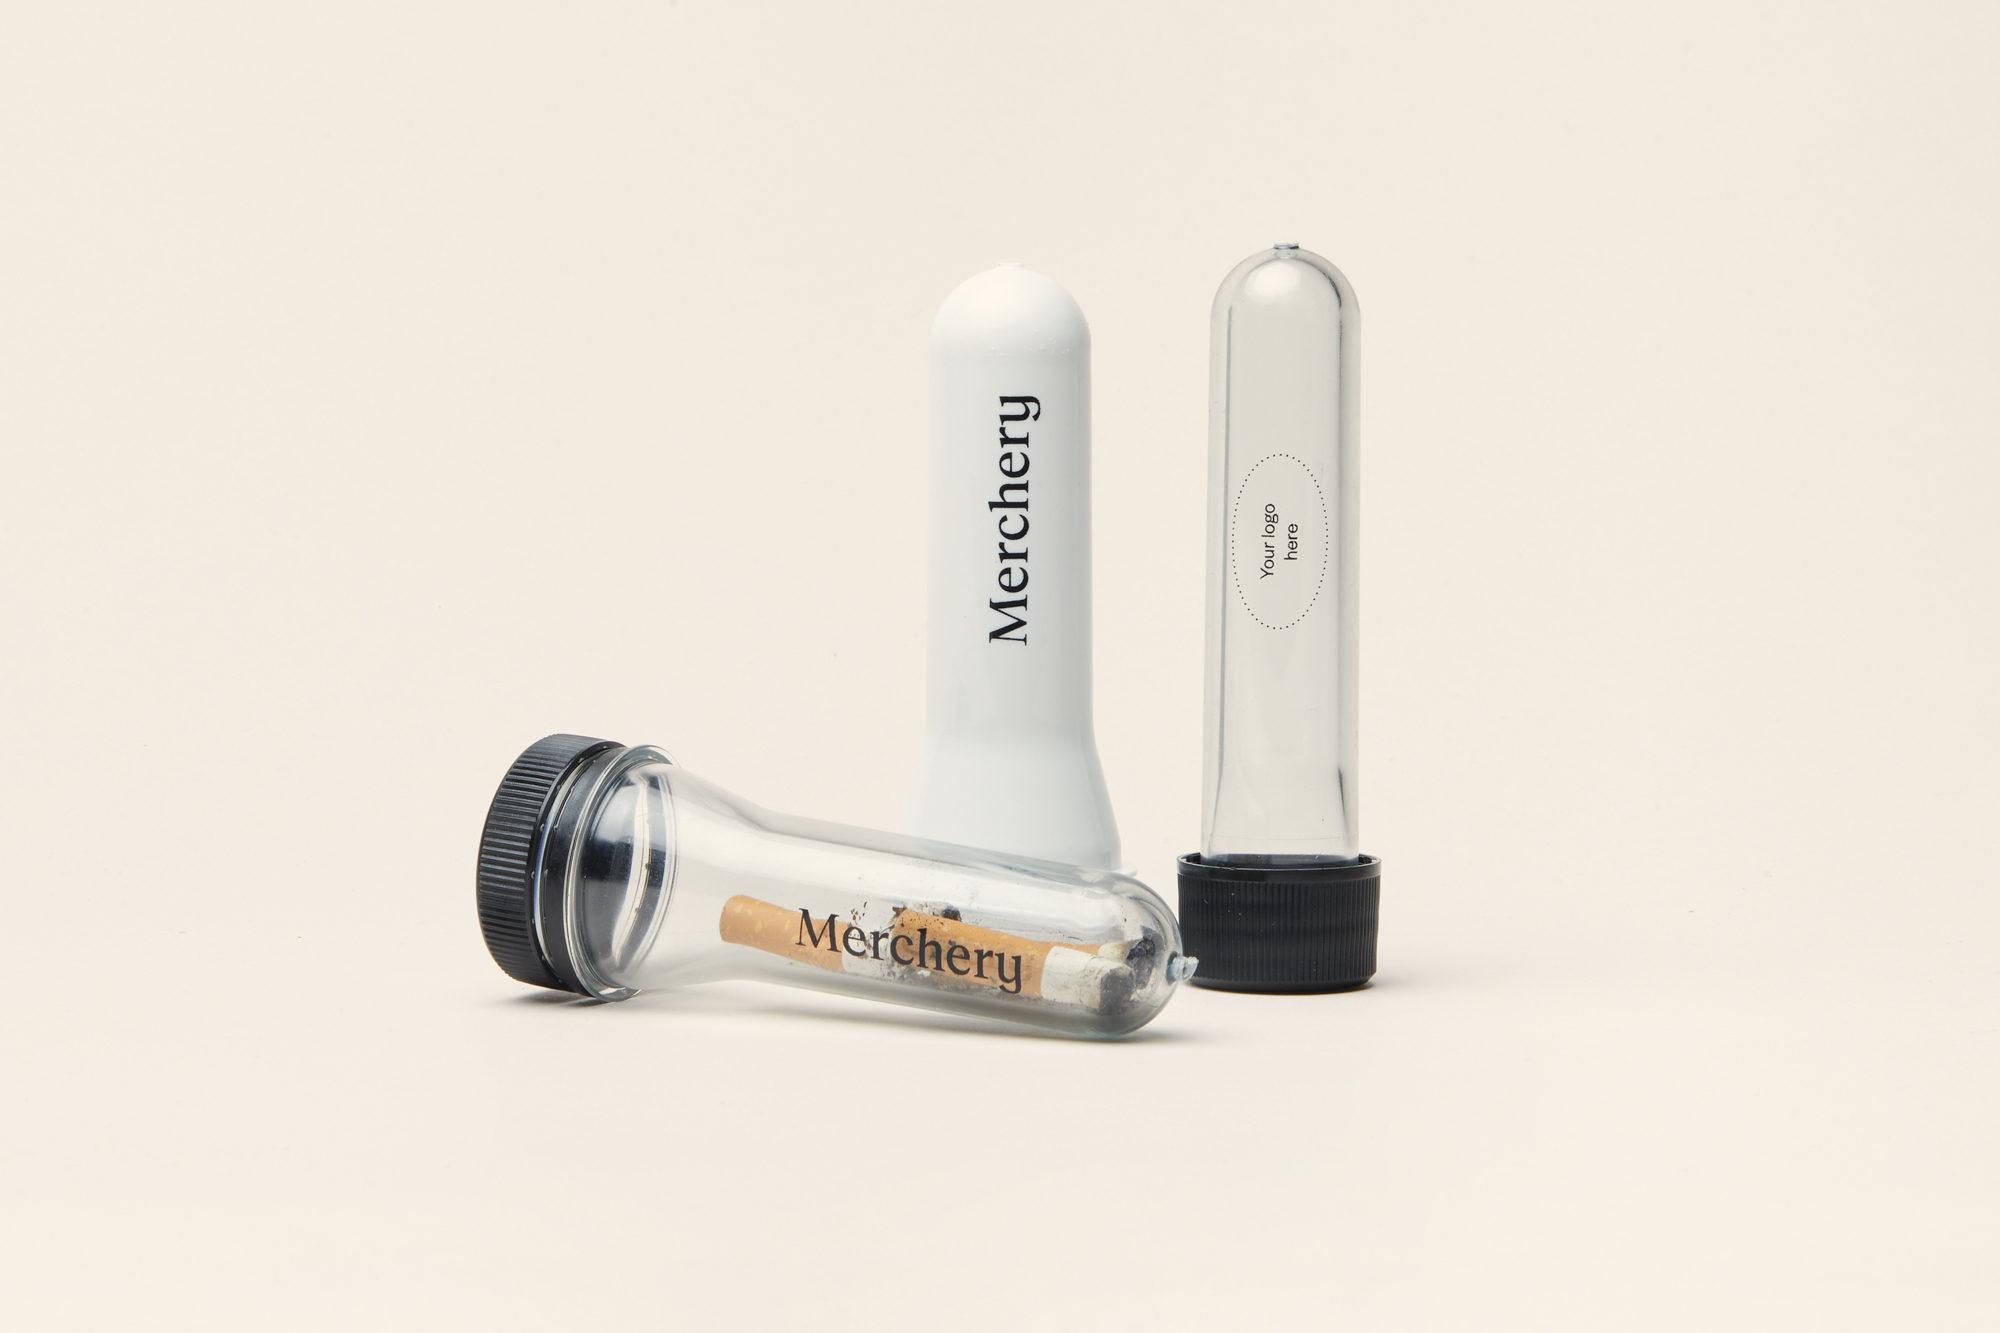 Merchery customized portable ashtray transparent white sustainable eco friendly thin